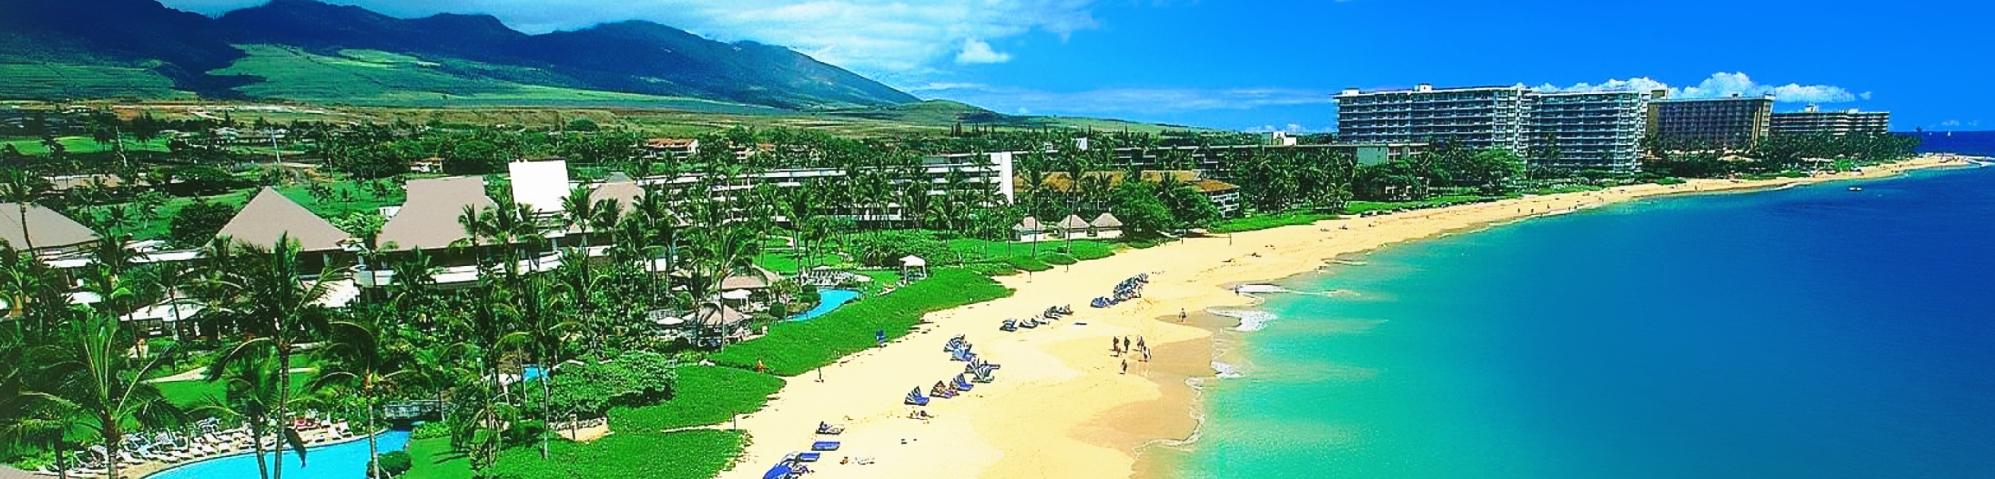 hawaiicondo2-bg